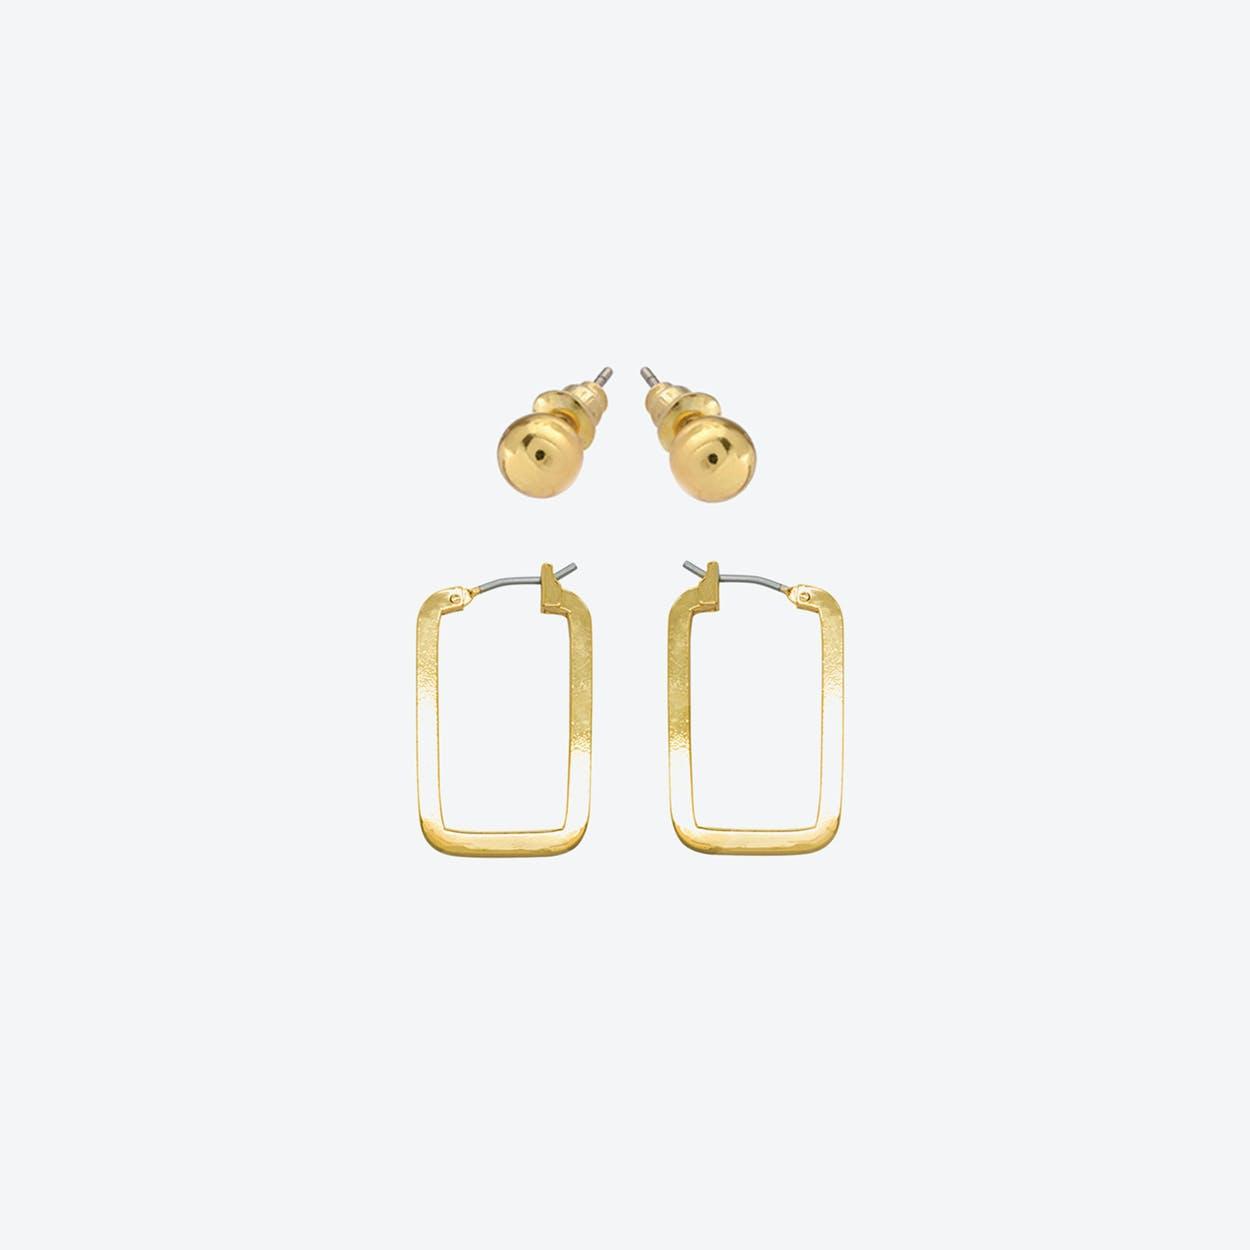 18k Gold Plated Geometric Earring Set